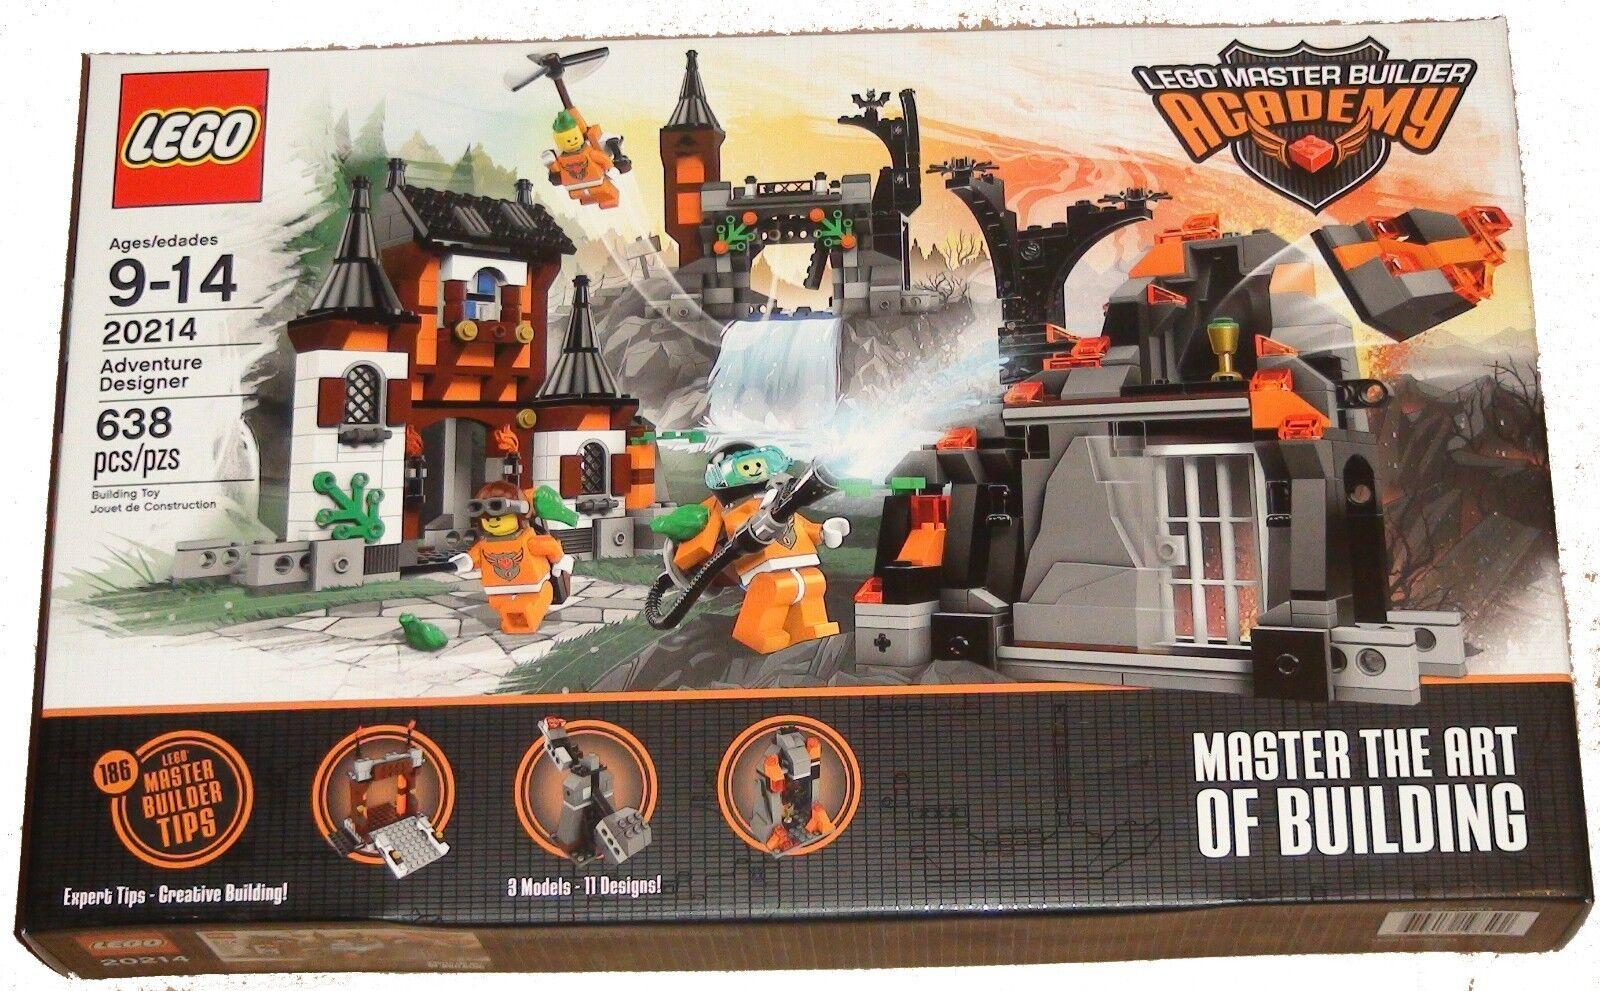 LEGO 20214 Adventure Designer Master Builder Academy 3 books 11 designs modular